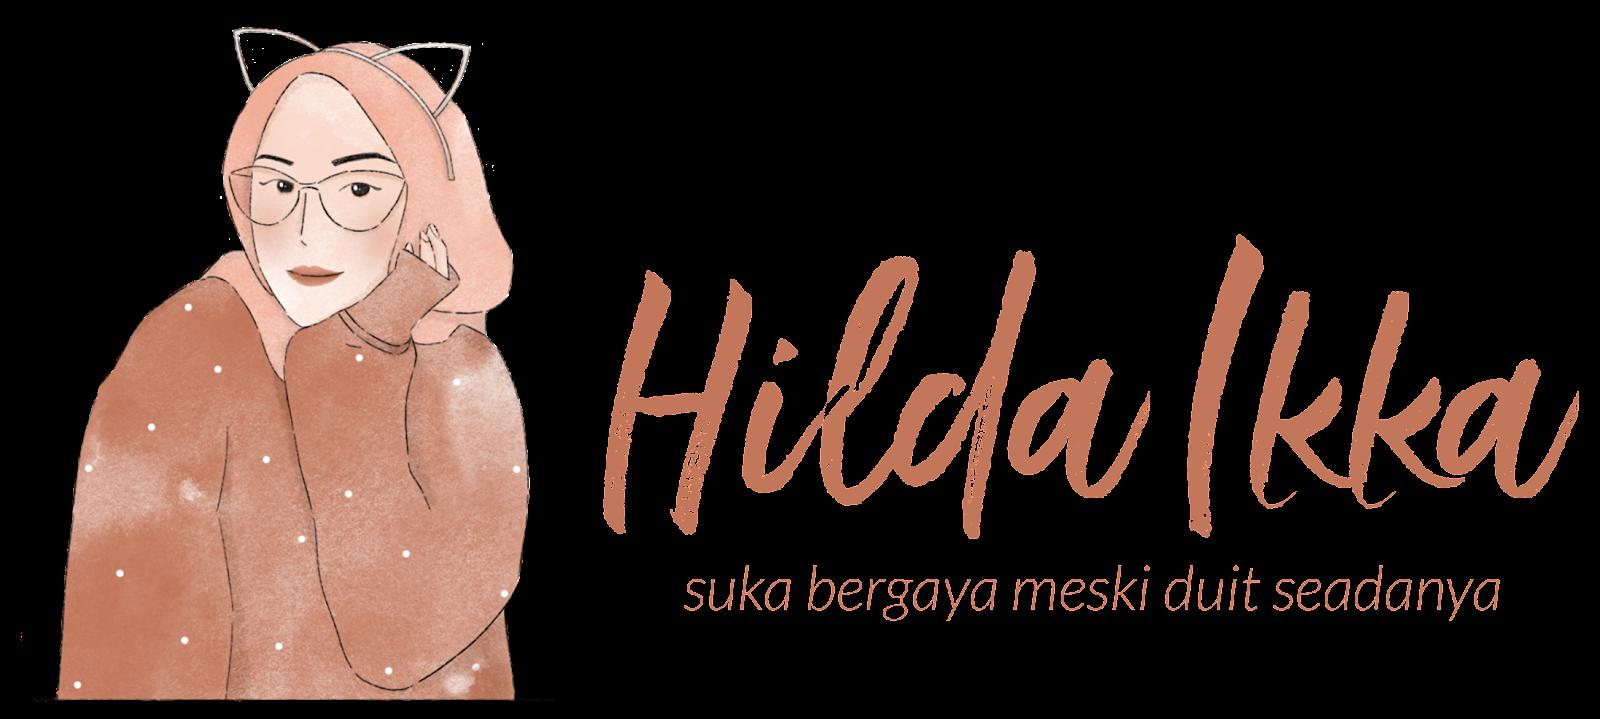 Hilda Ikka